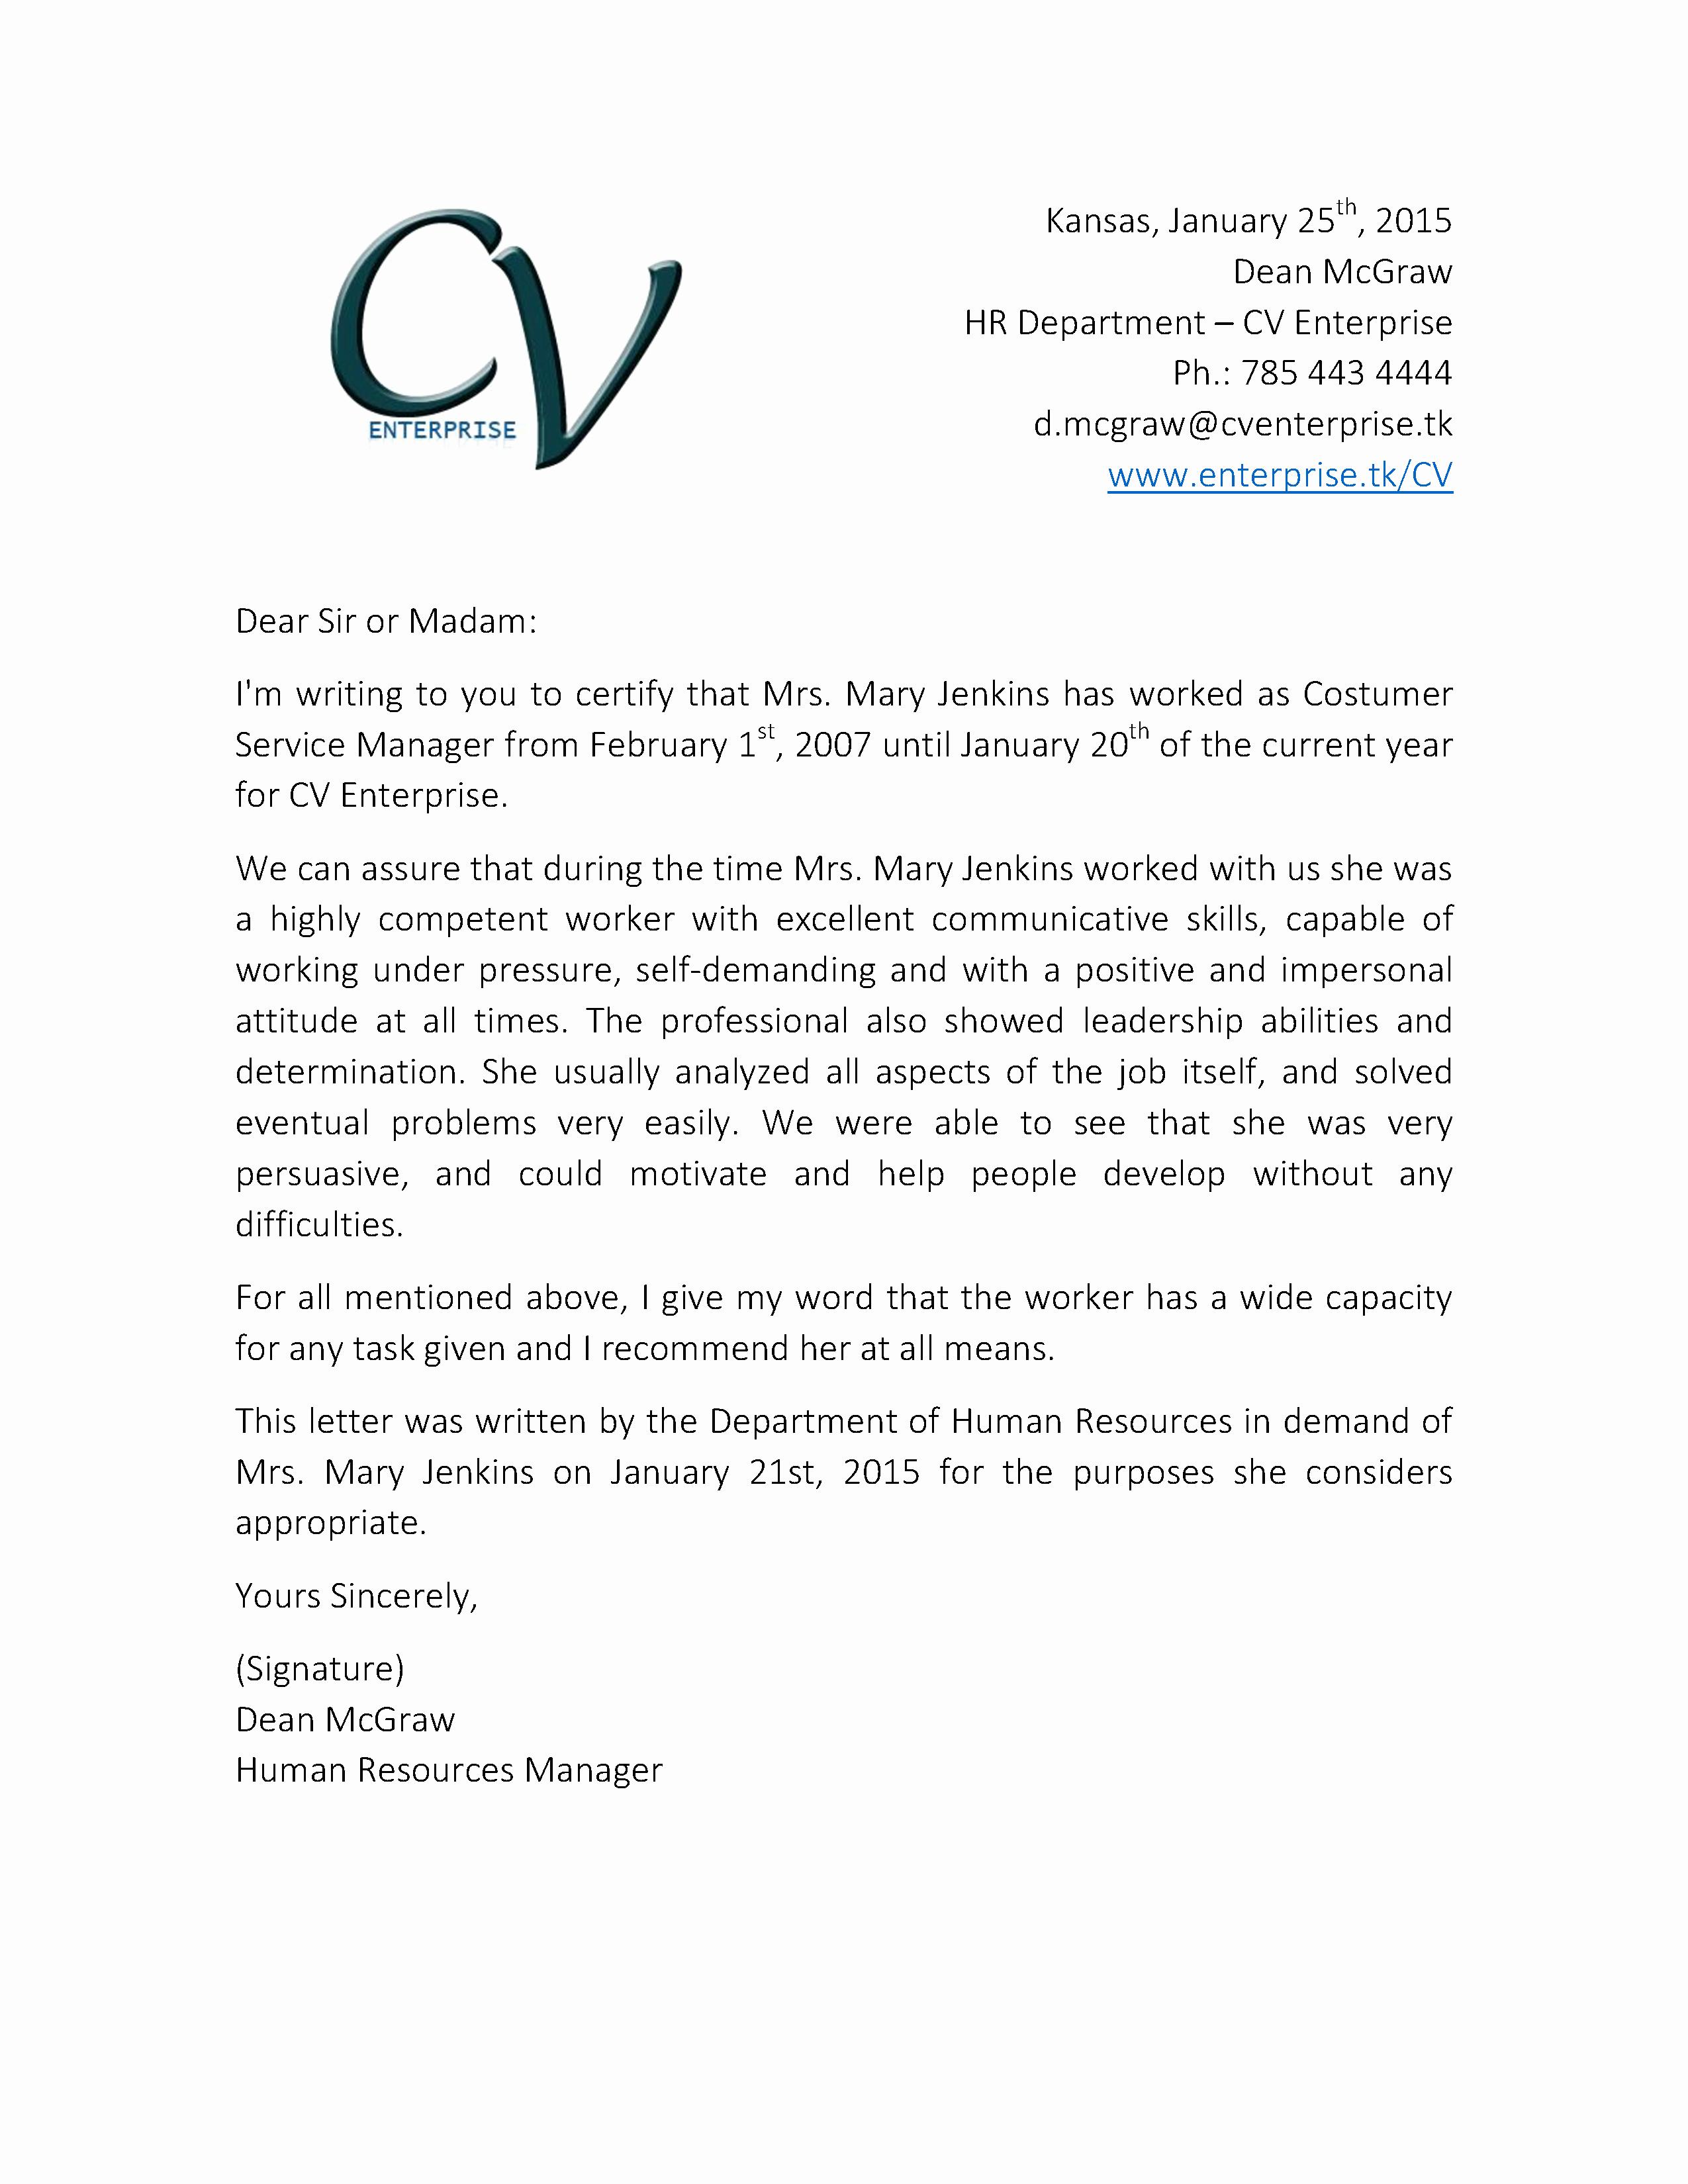 Re Mendation Letter for Customer Service Job 2 Grow